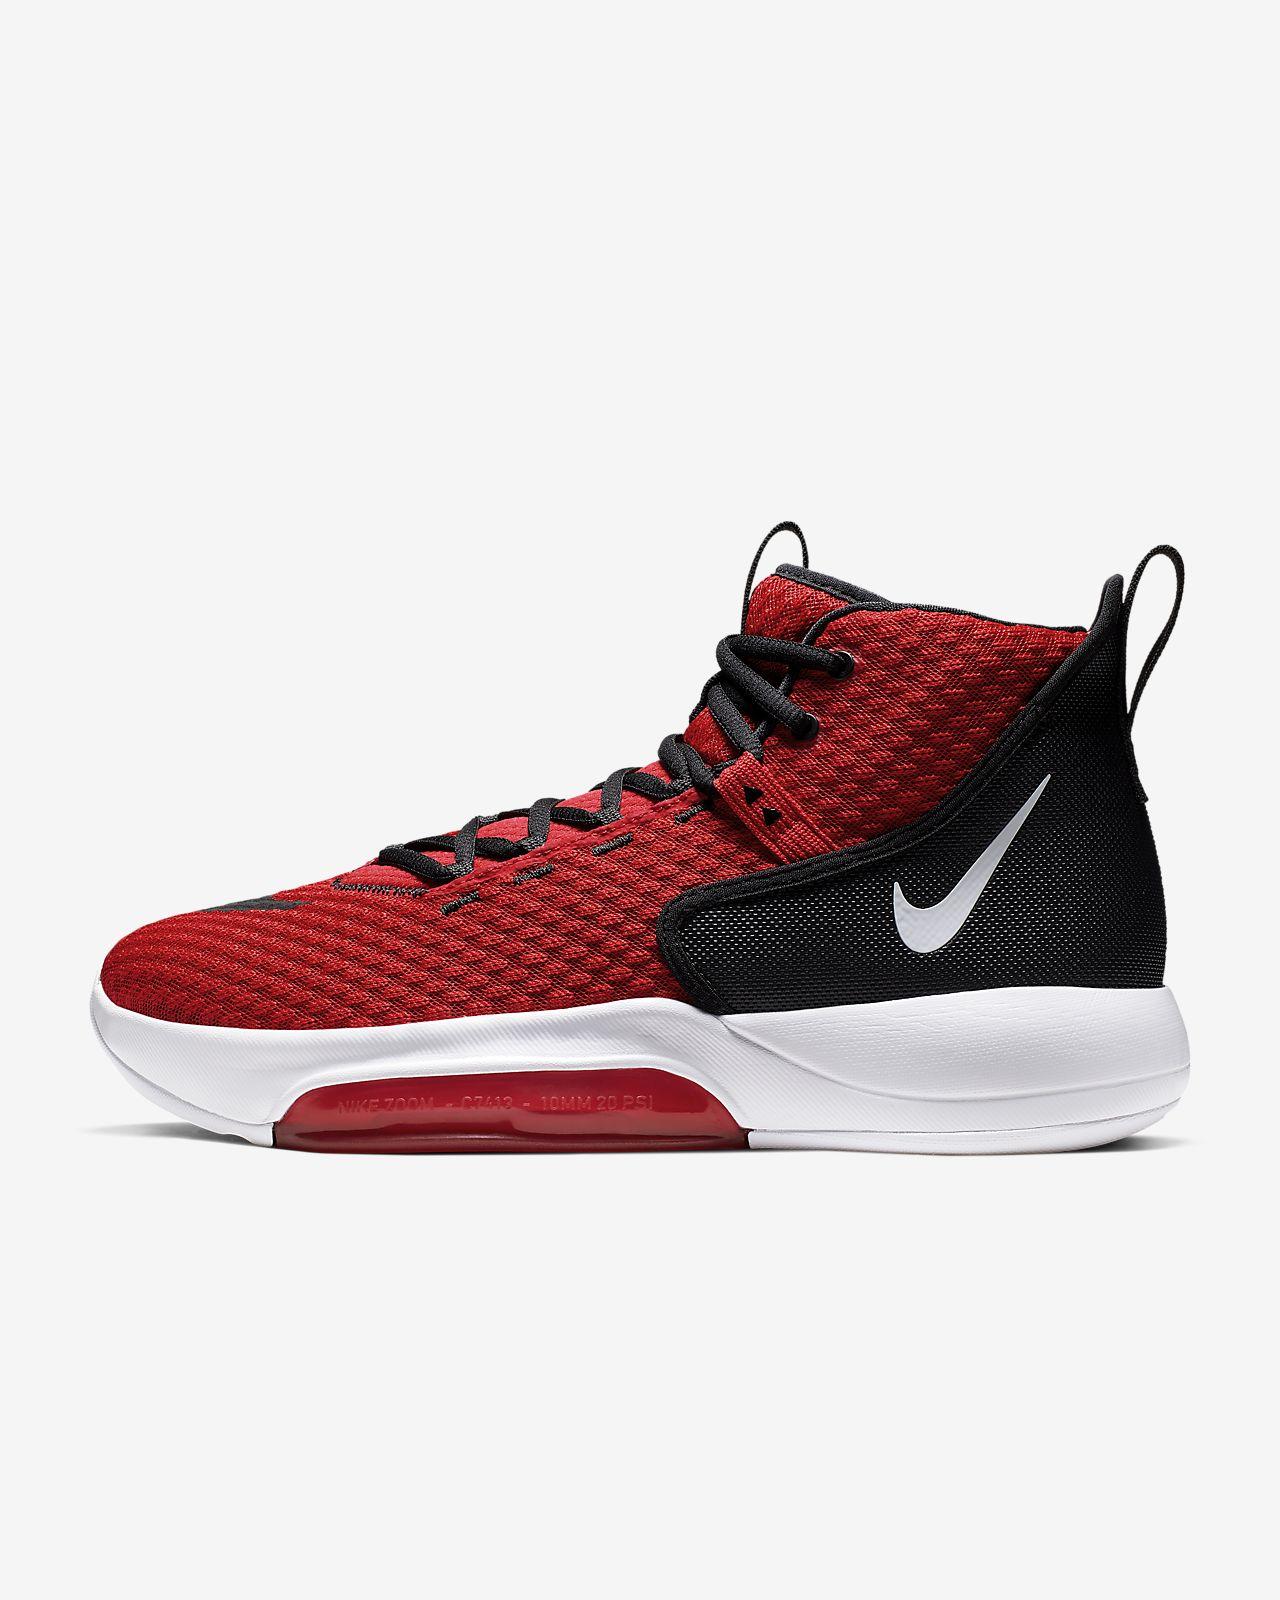 Chaussure de basketball Nike Zoom Rize (Team)